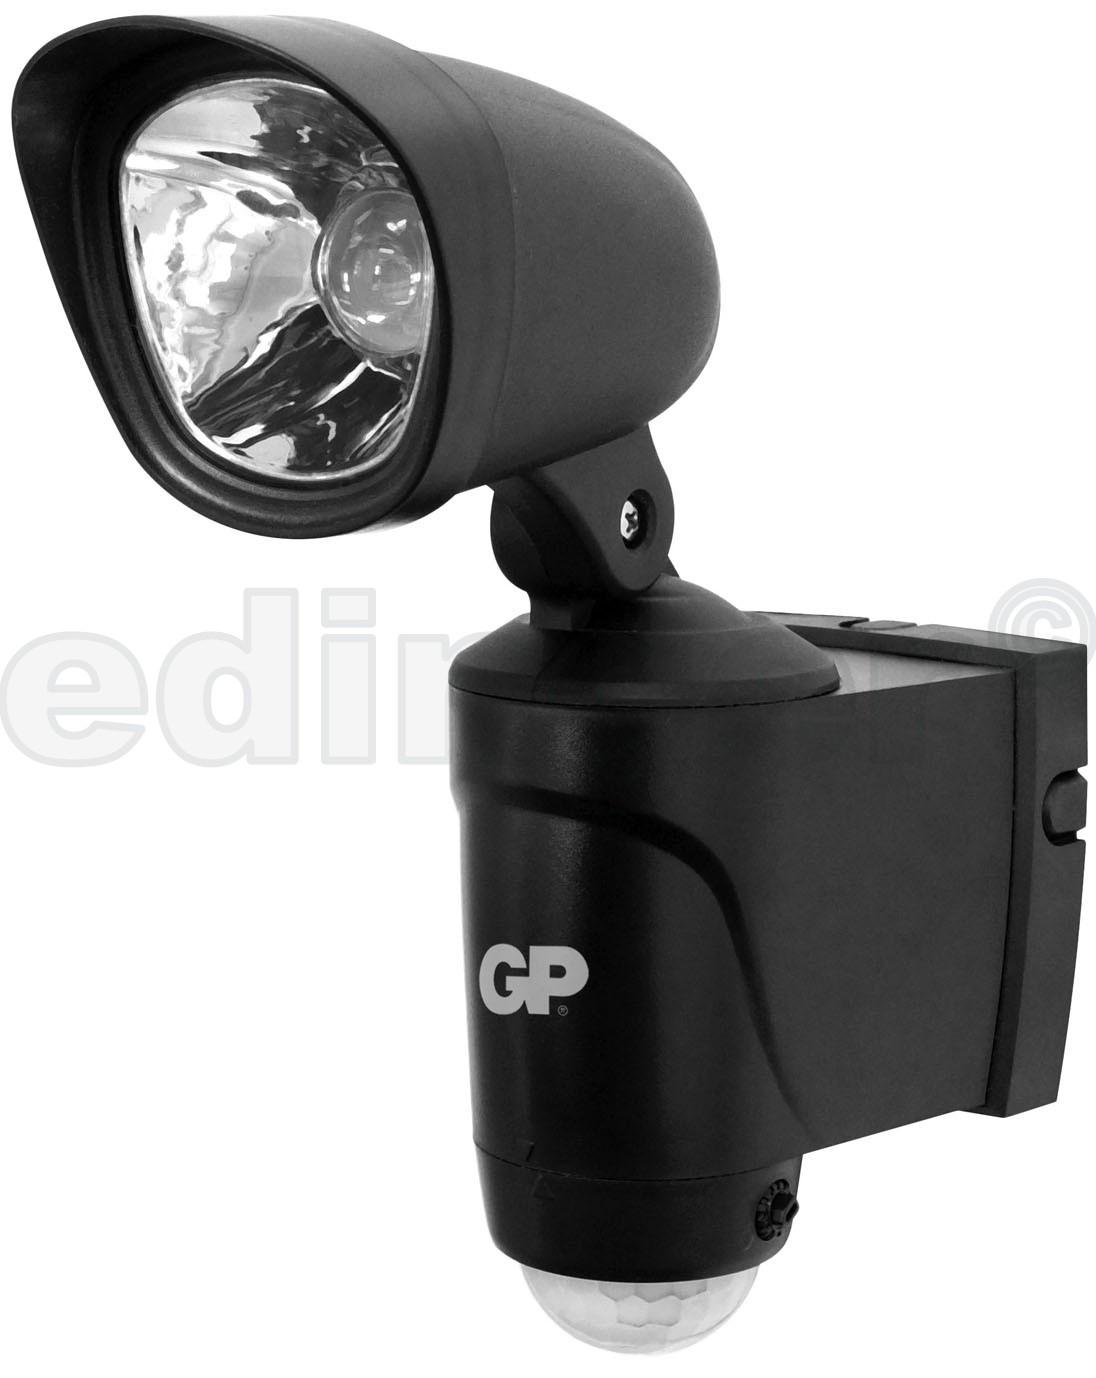 GP Safeguard LED Sensorleuchte RF3 Bild 1